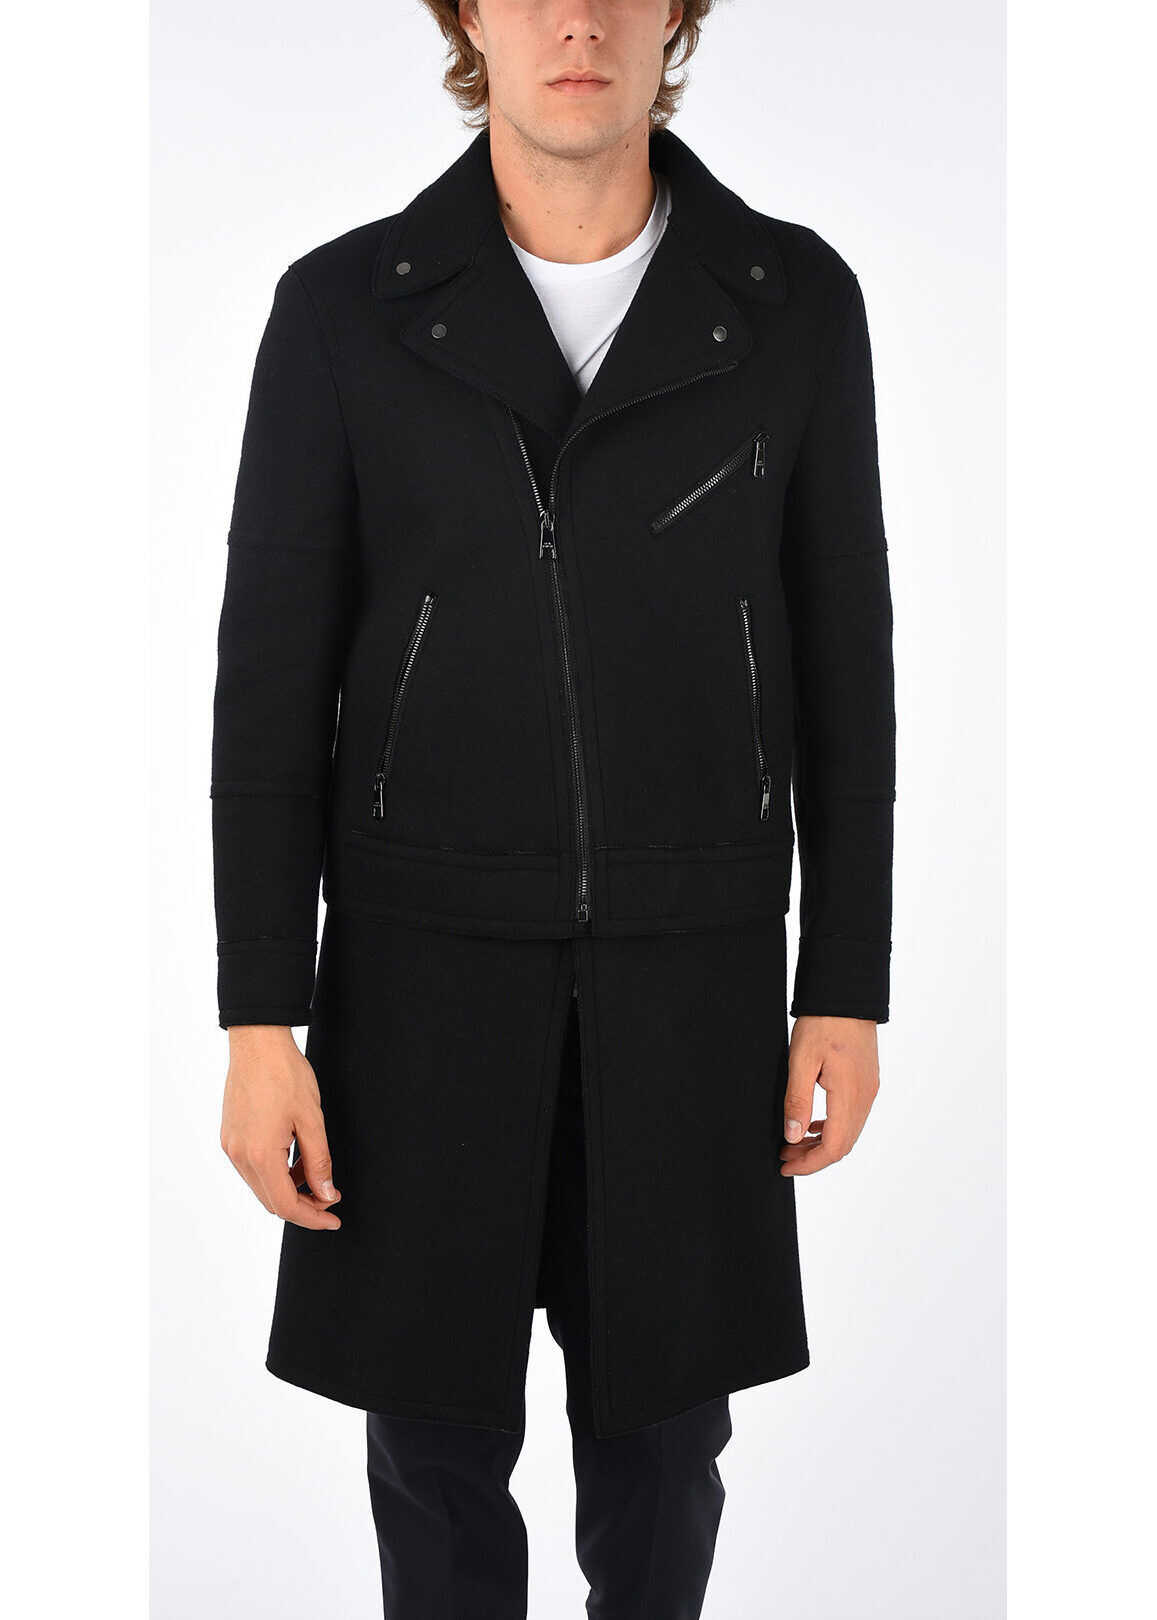 Neil Barrett Wool Blend Coat BLACK